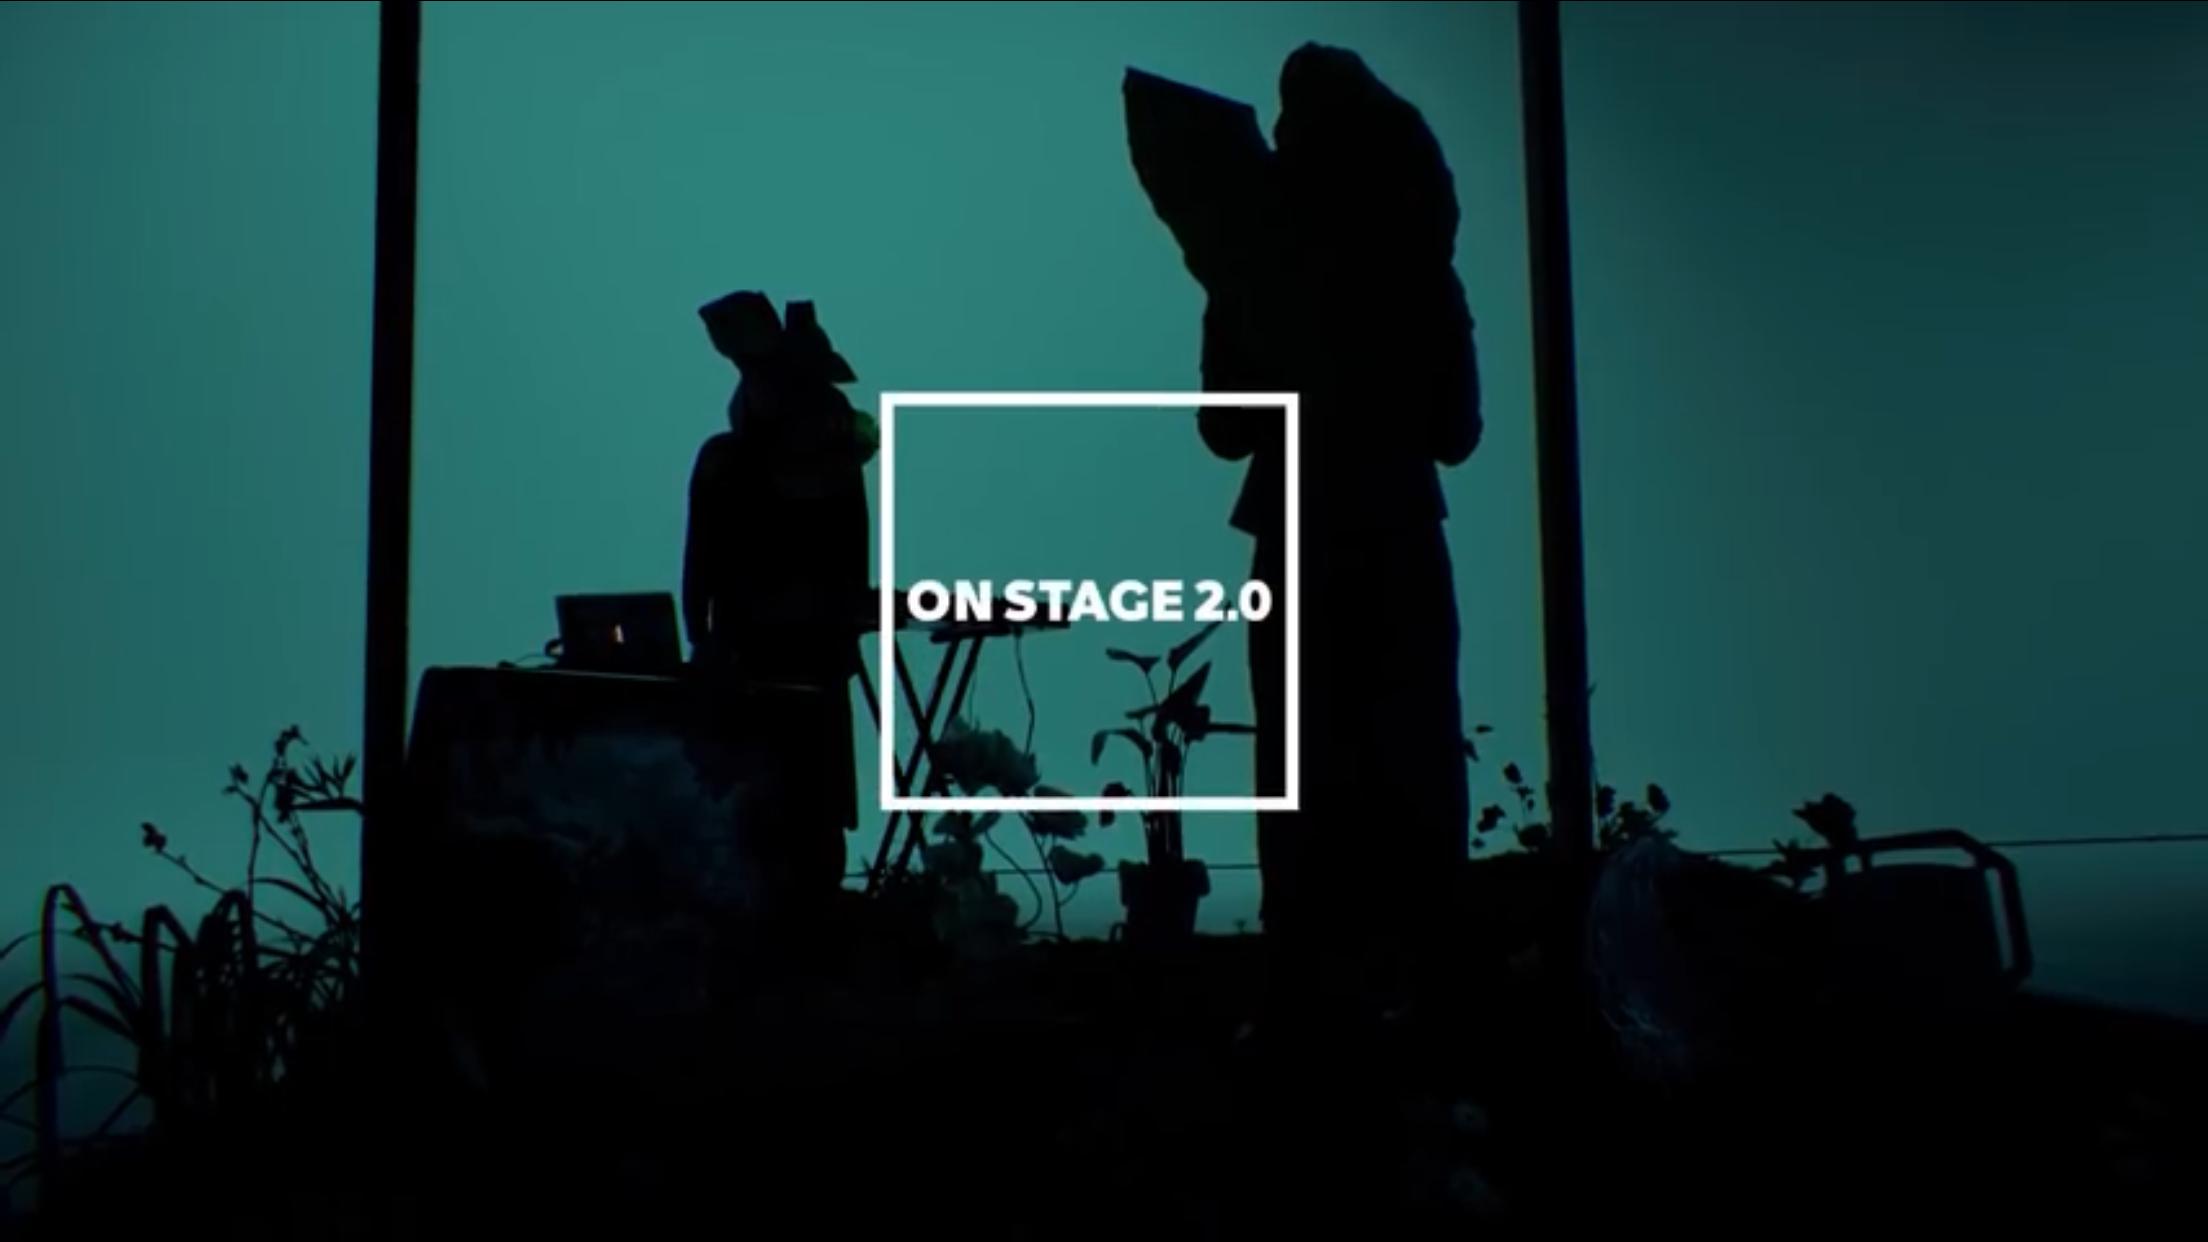 [KR🇰🇷]Balming Tiger × ONSTAGE2.0